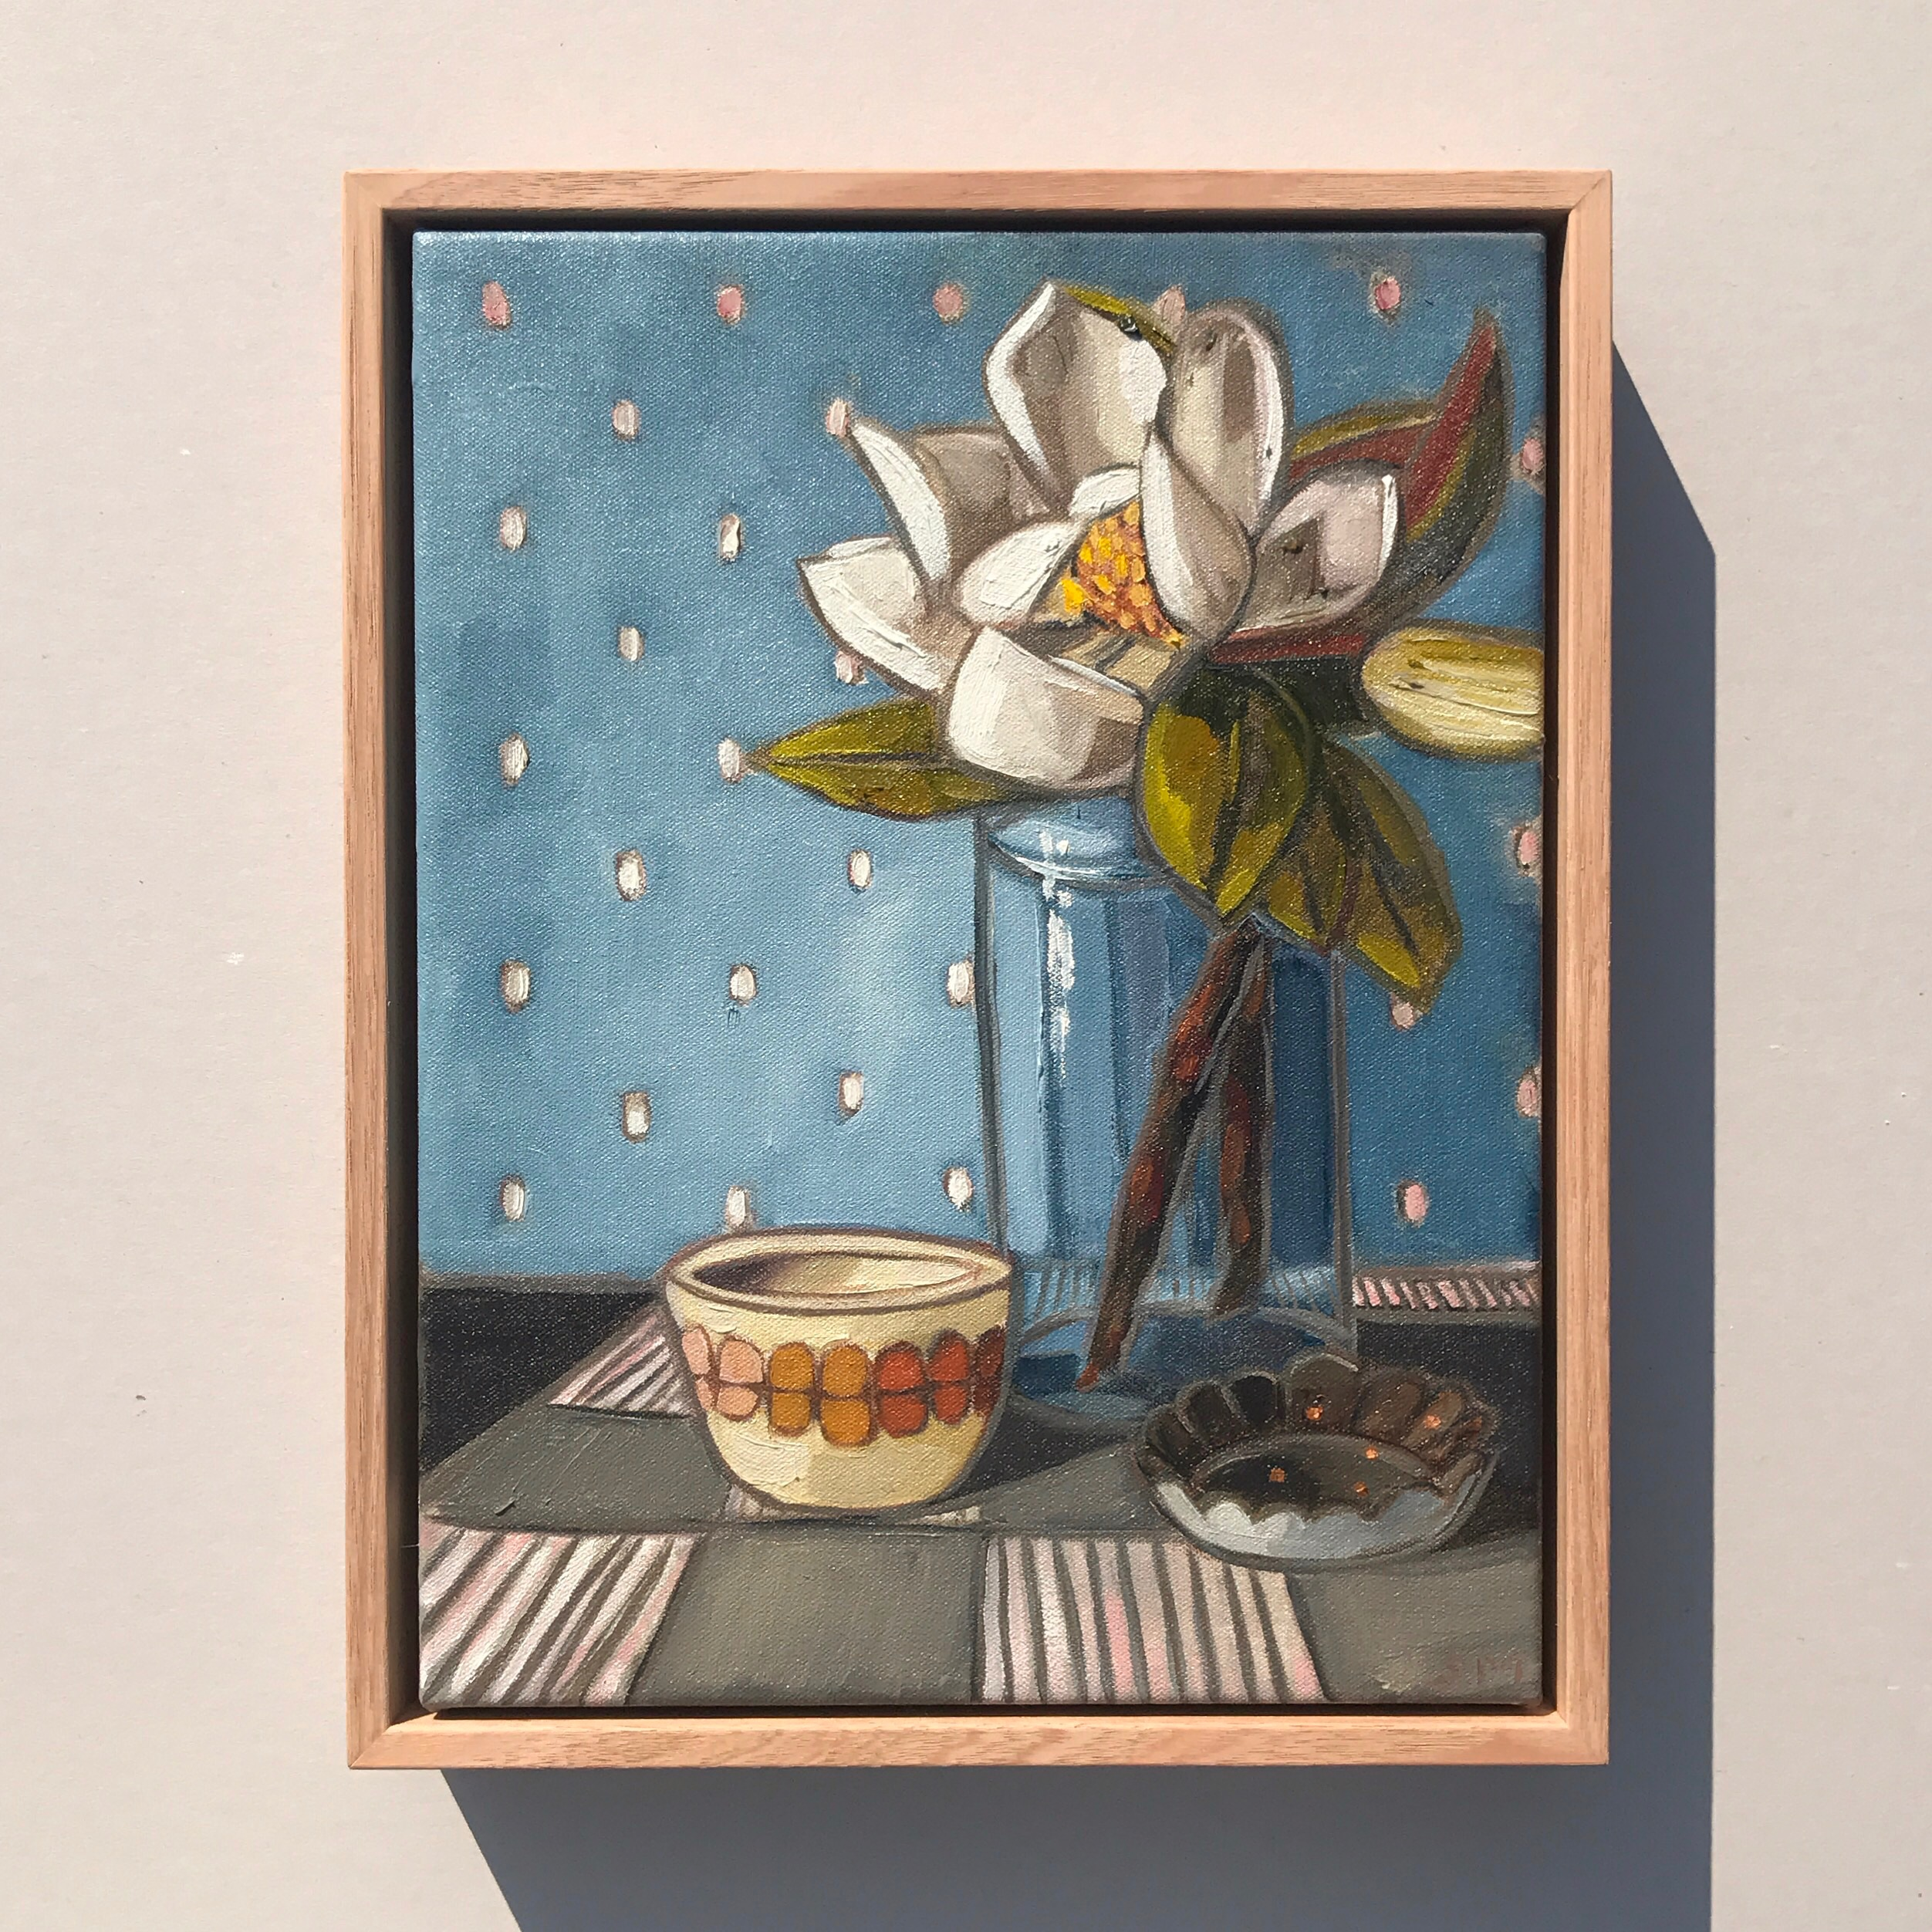 04_17 Country Magnolia & Stripes $645 36x29cm